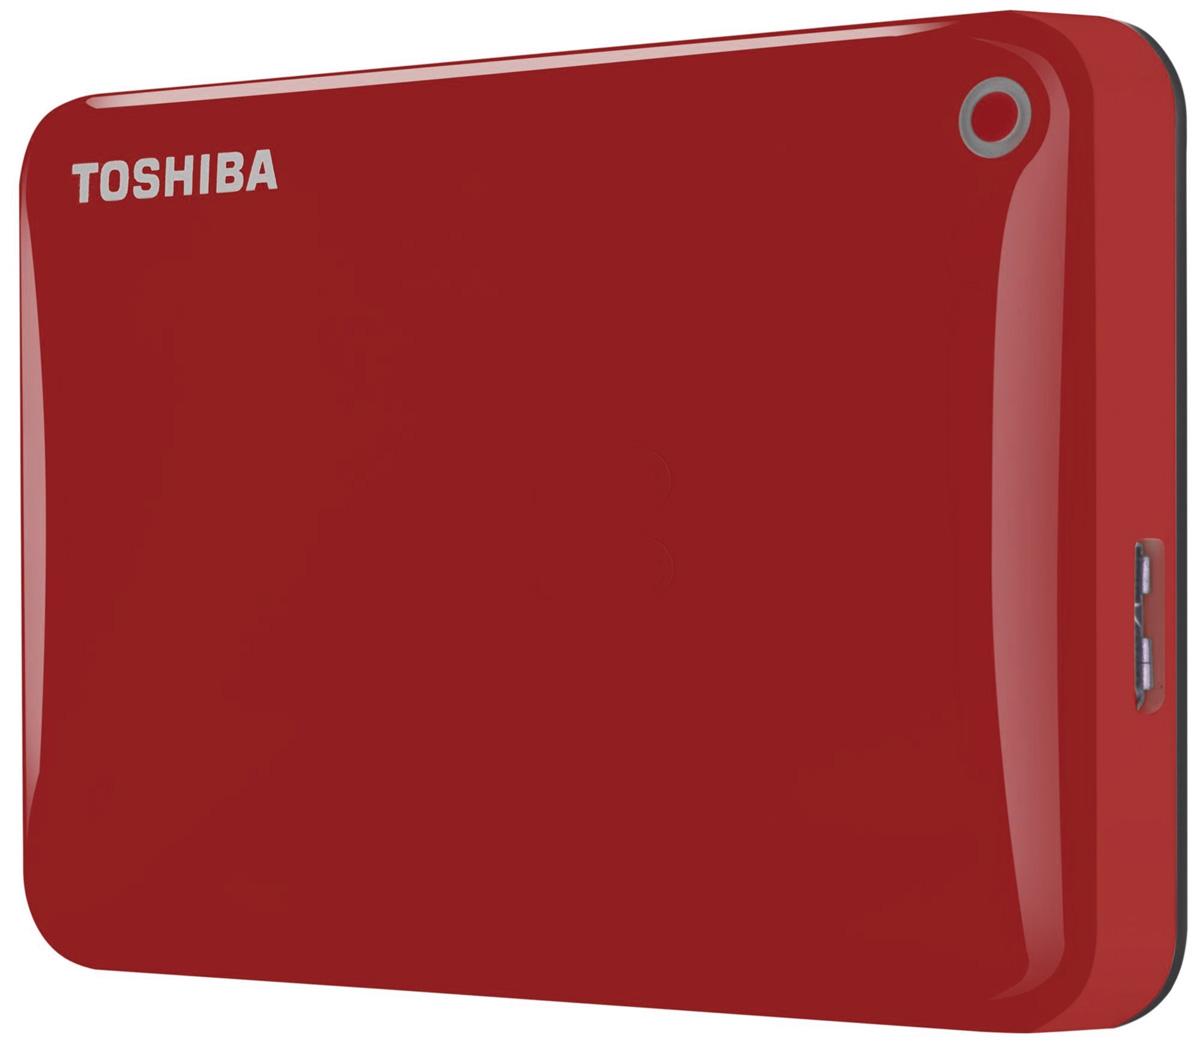 Toshiba Canvio Connect II 500GB, Red внешний жесткий диск (HDTC805ER3AA) - Носители информации